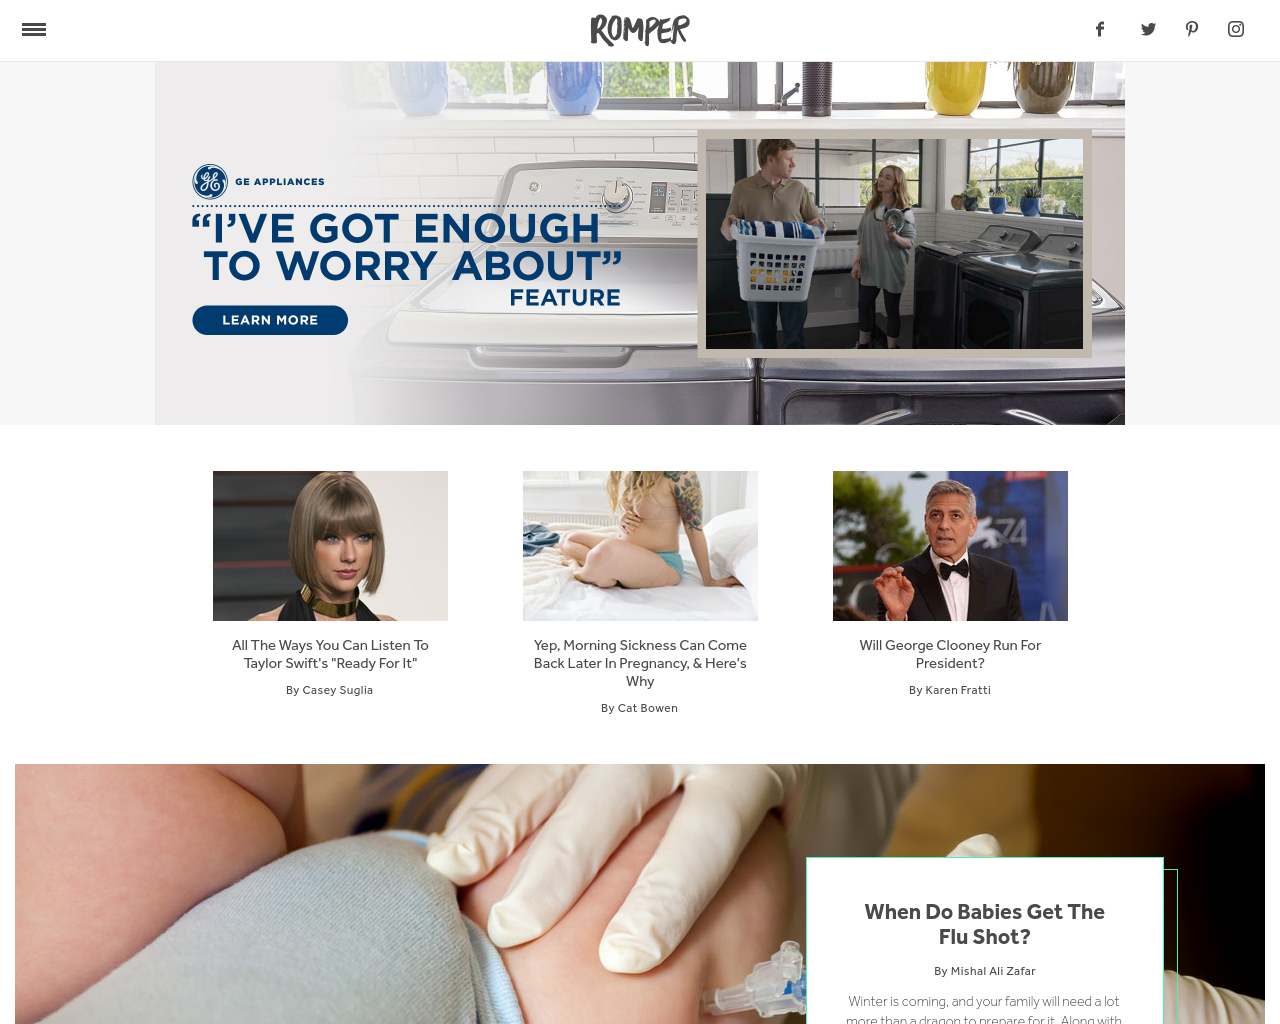 Romper-Advertising-Reviews-Pricing